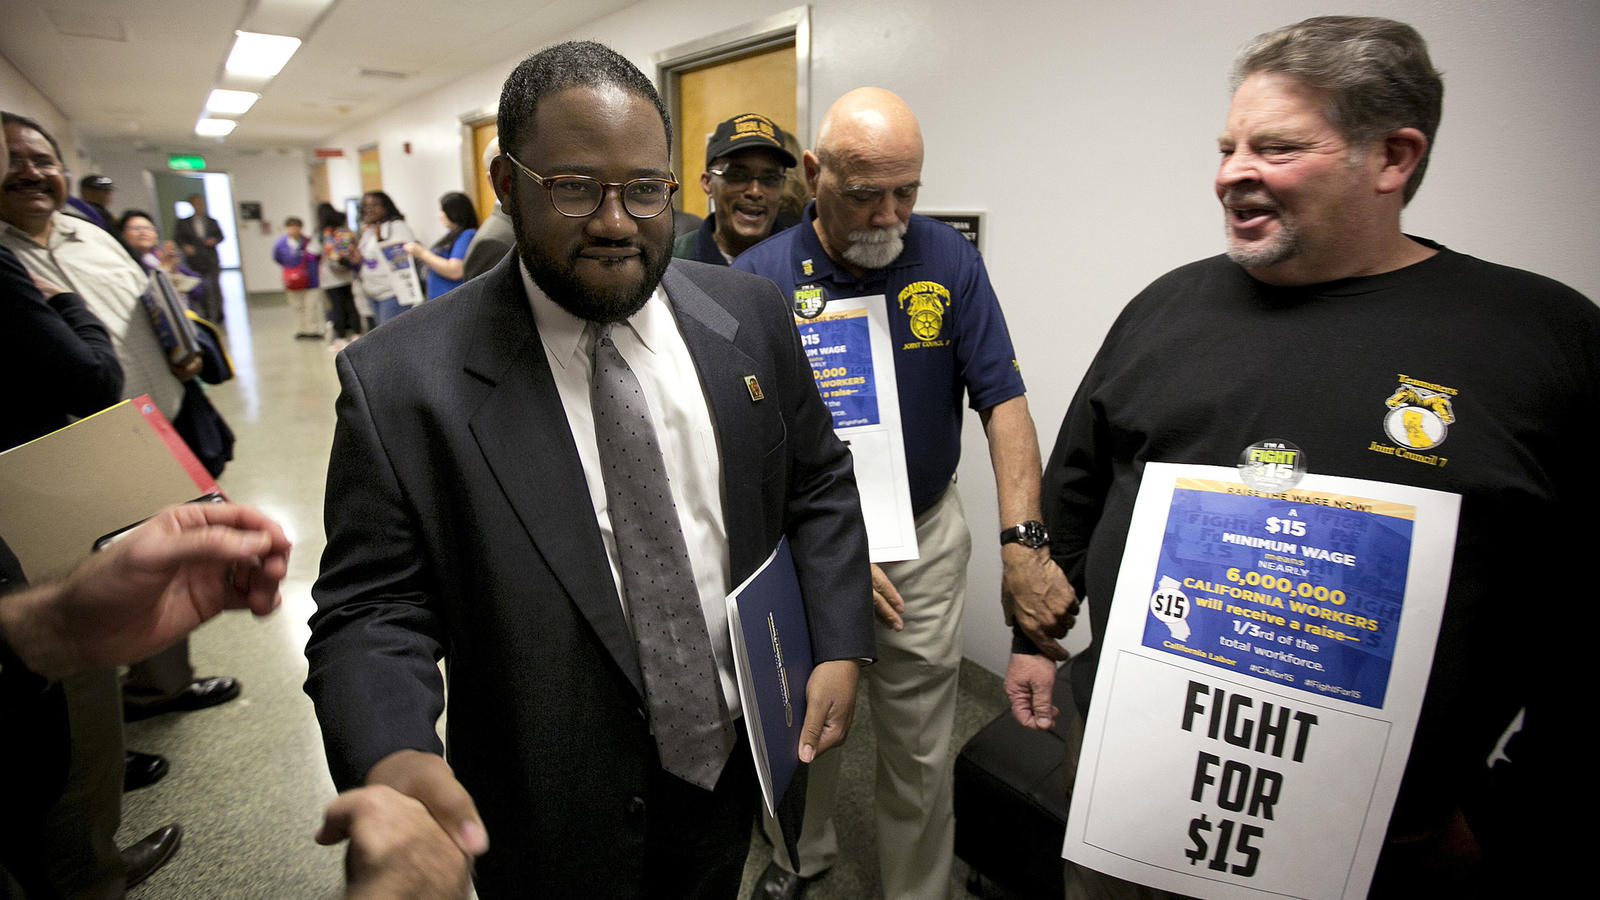 Assemblyman Sebastian Ridley-Thomas wrote the bill to prohibit consumer racial profiling. (Rich Pedroncelli / Associated Press)